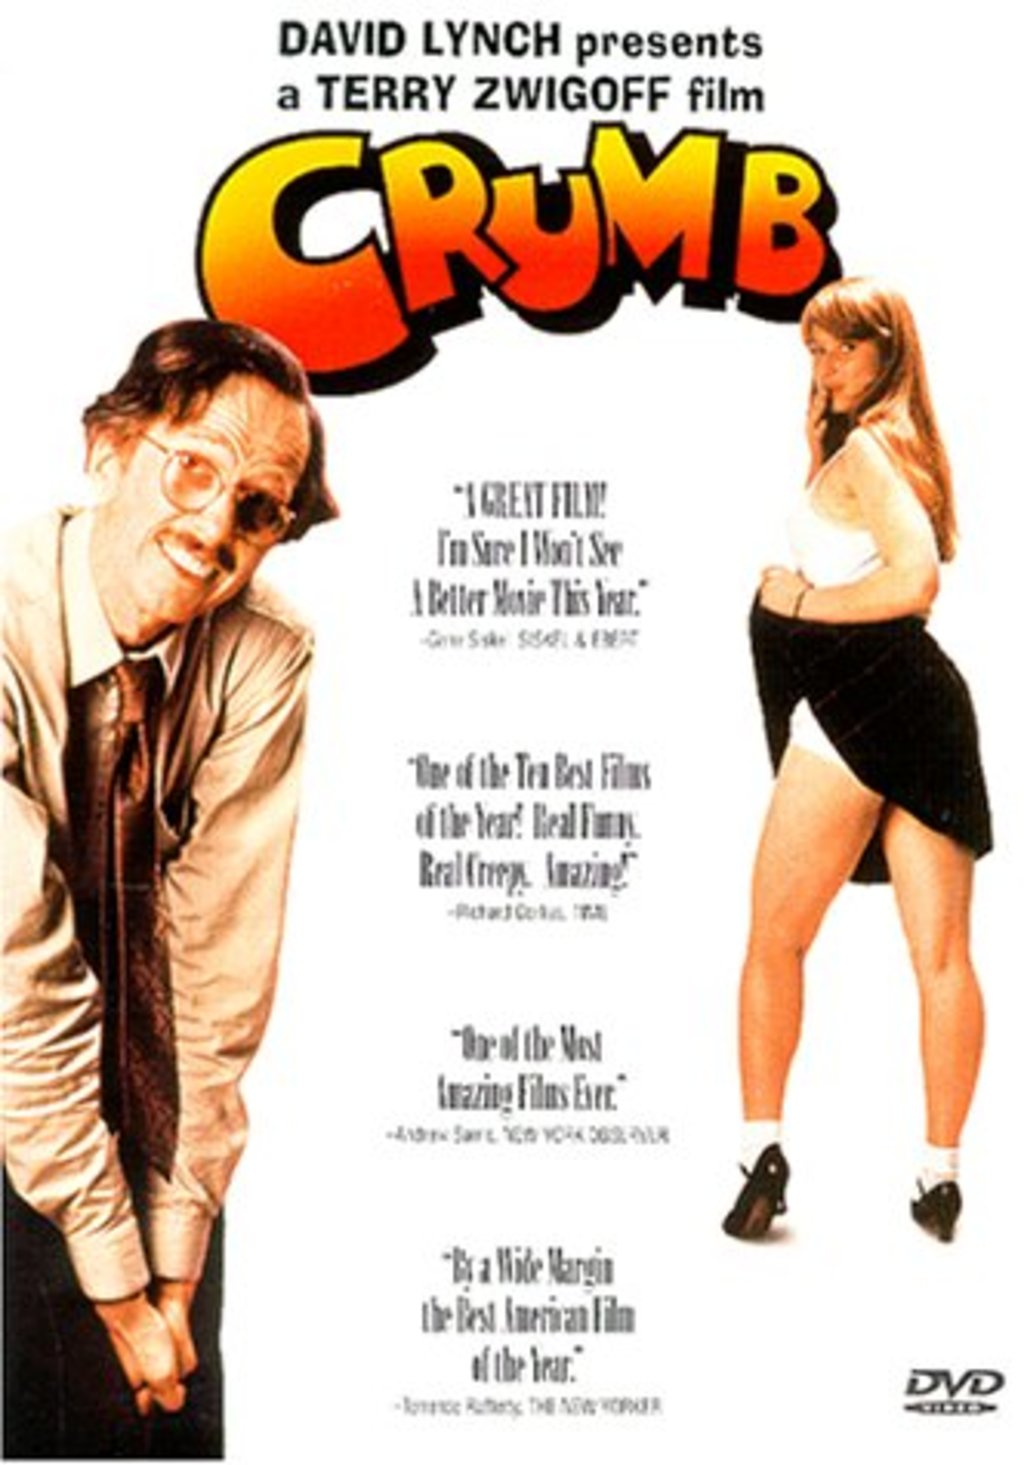 Watch Crumb On Netflix Today Netflixmoviescom